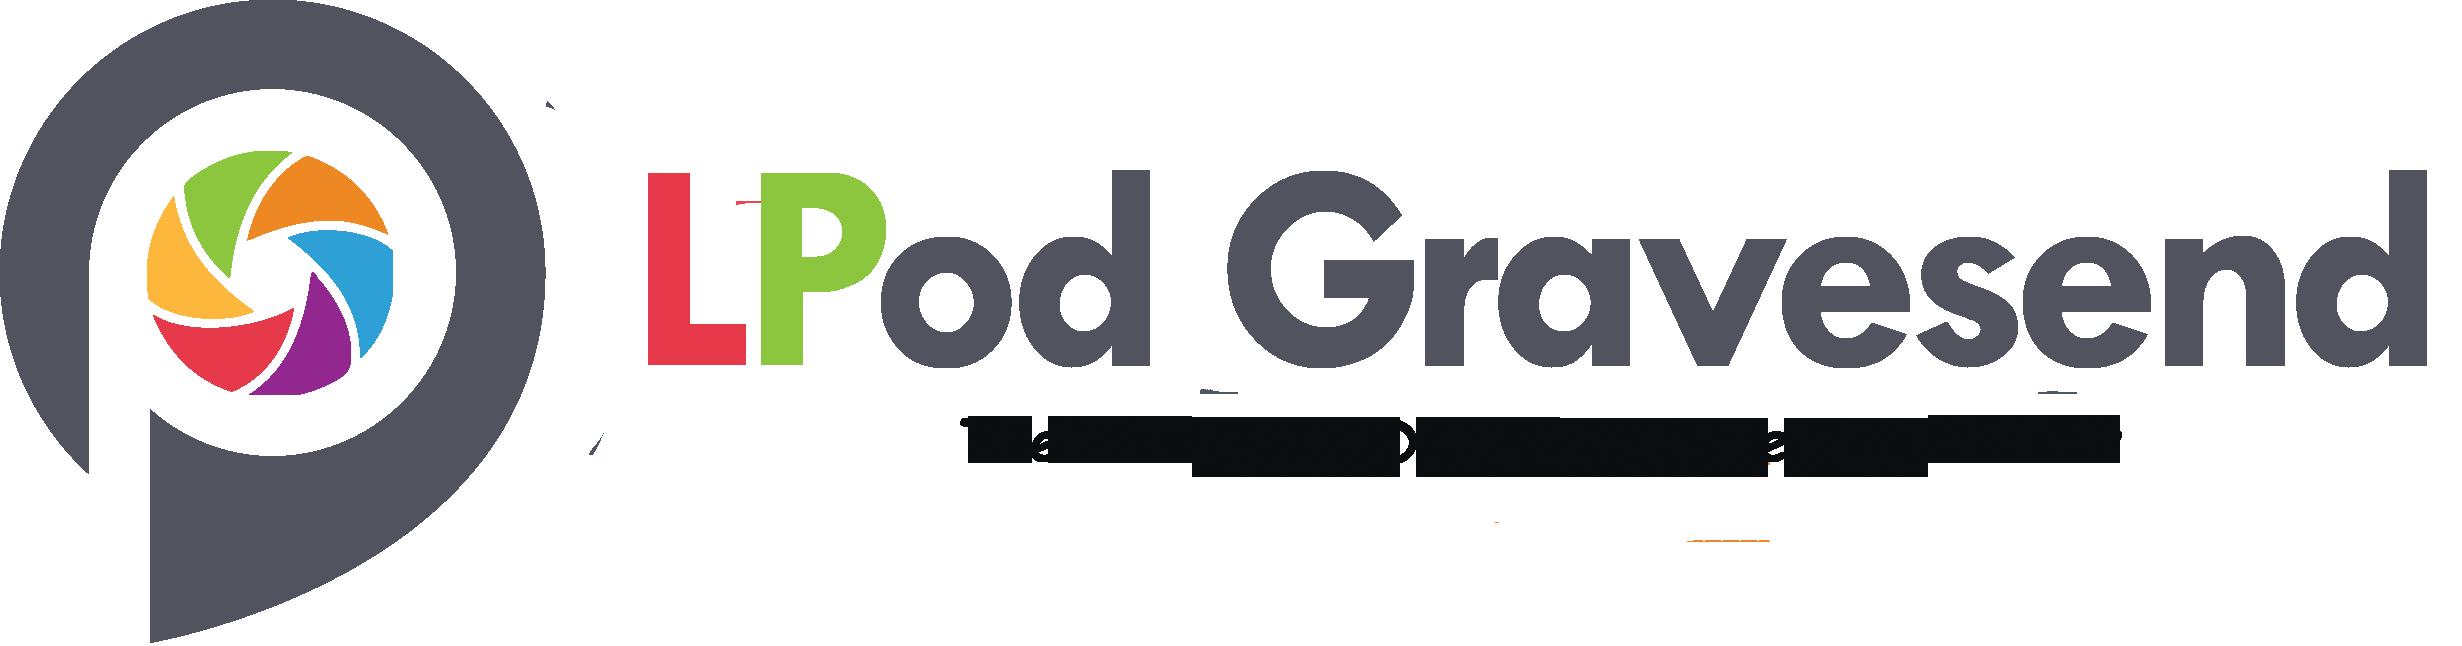 Intensive Driving Courses Gravesend, fast pass driving courses gravesend, one week driving courses gravesend